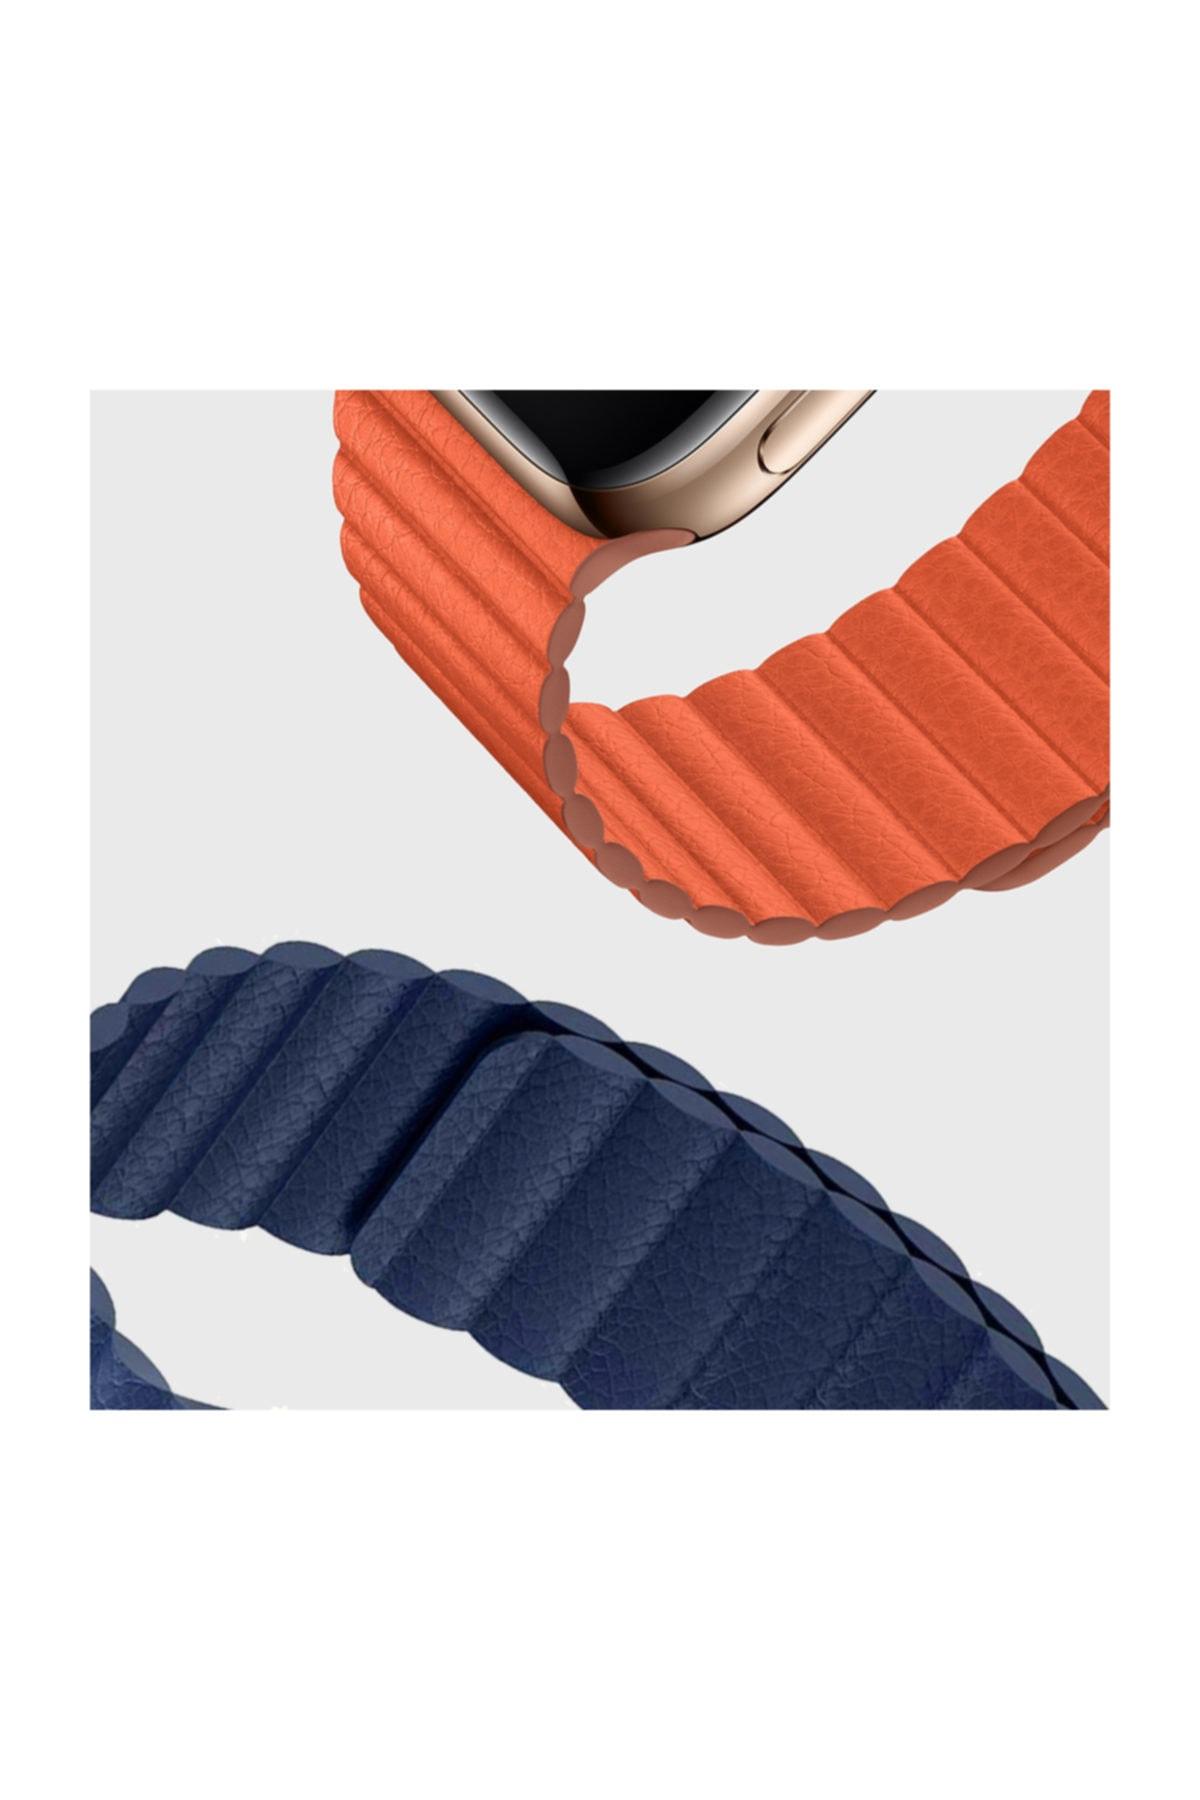 Telefon Aksesuarları Watch Series 5 44mm Twist Leather Loop Kordon, Microsonic Lacivert 1